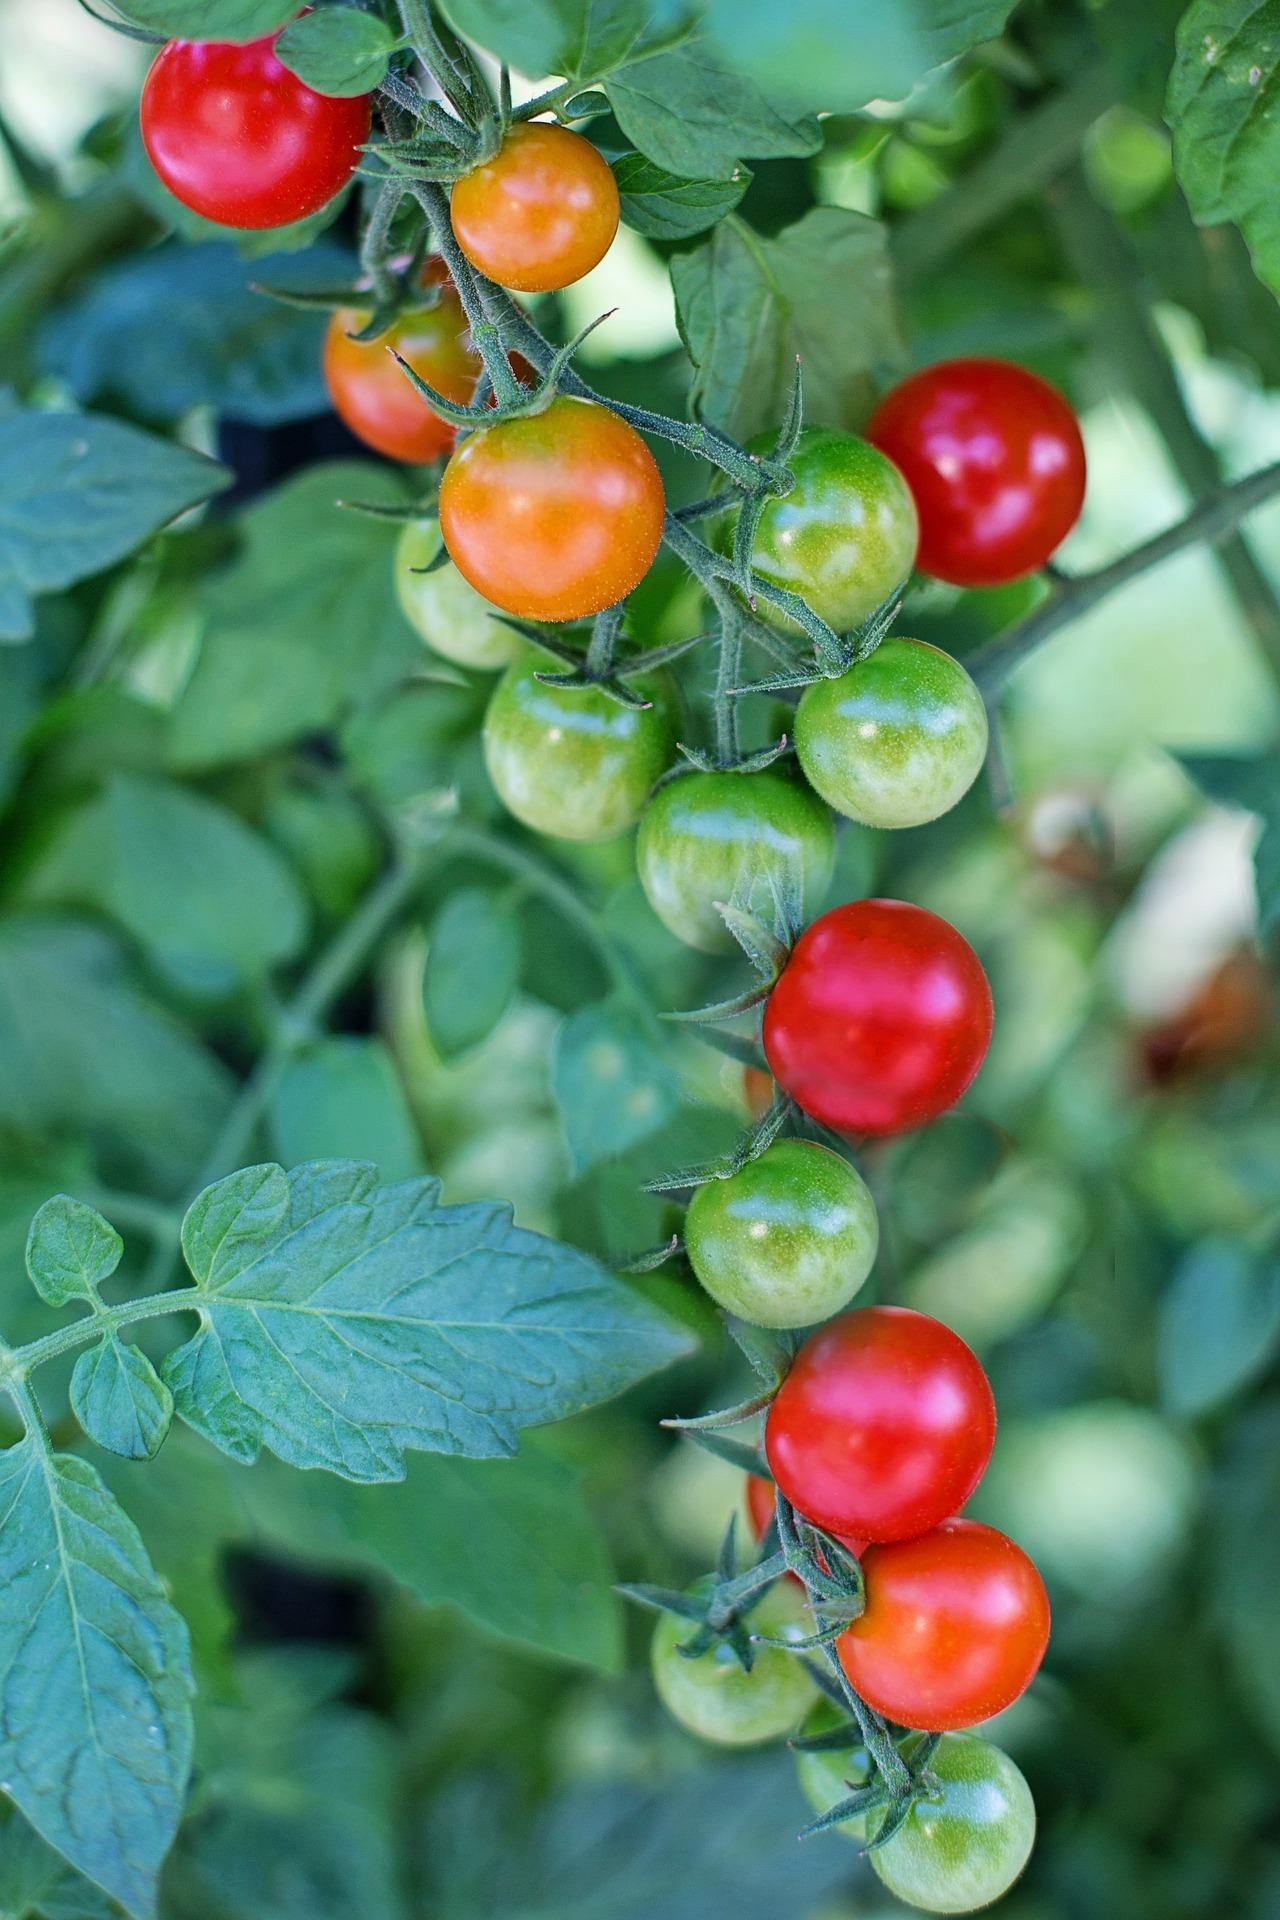 cherry-tomatoes-2566449_1920